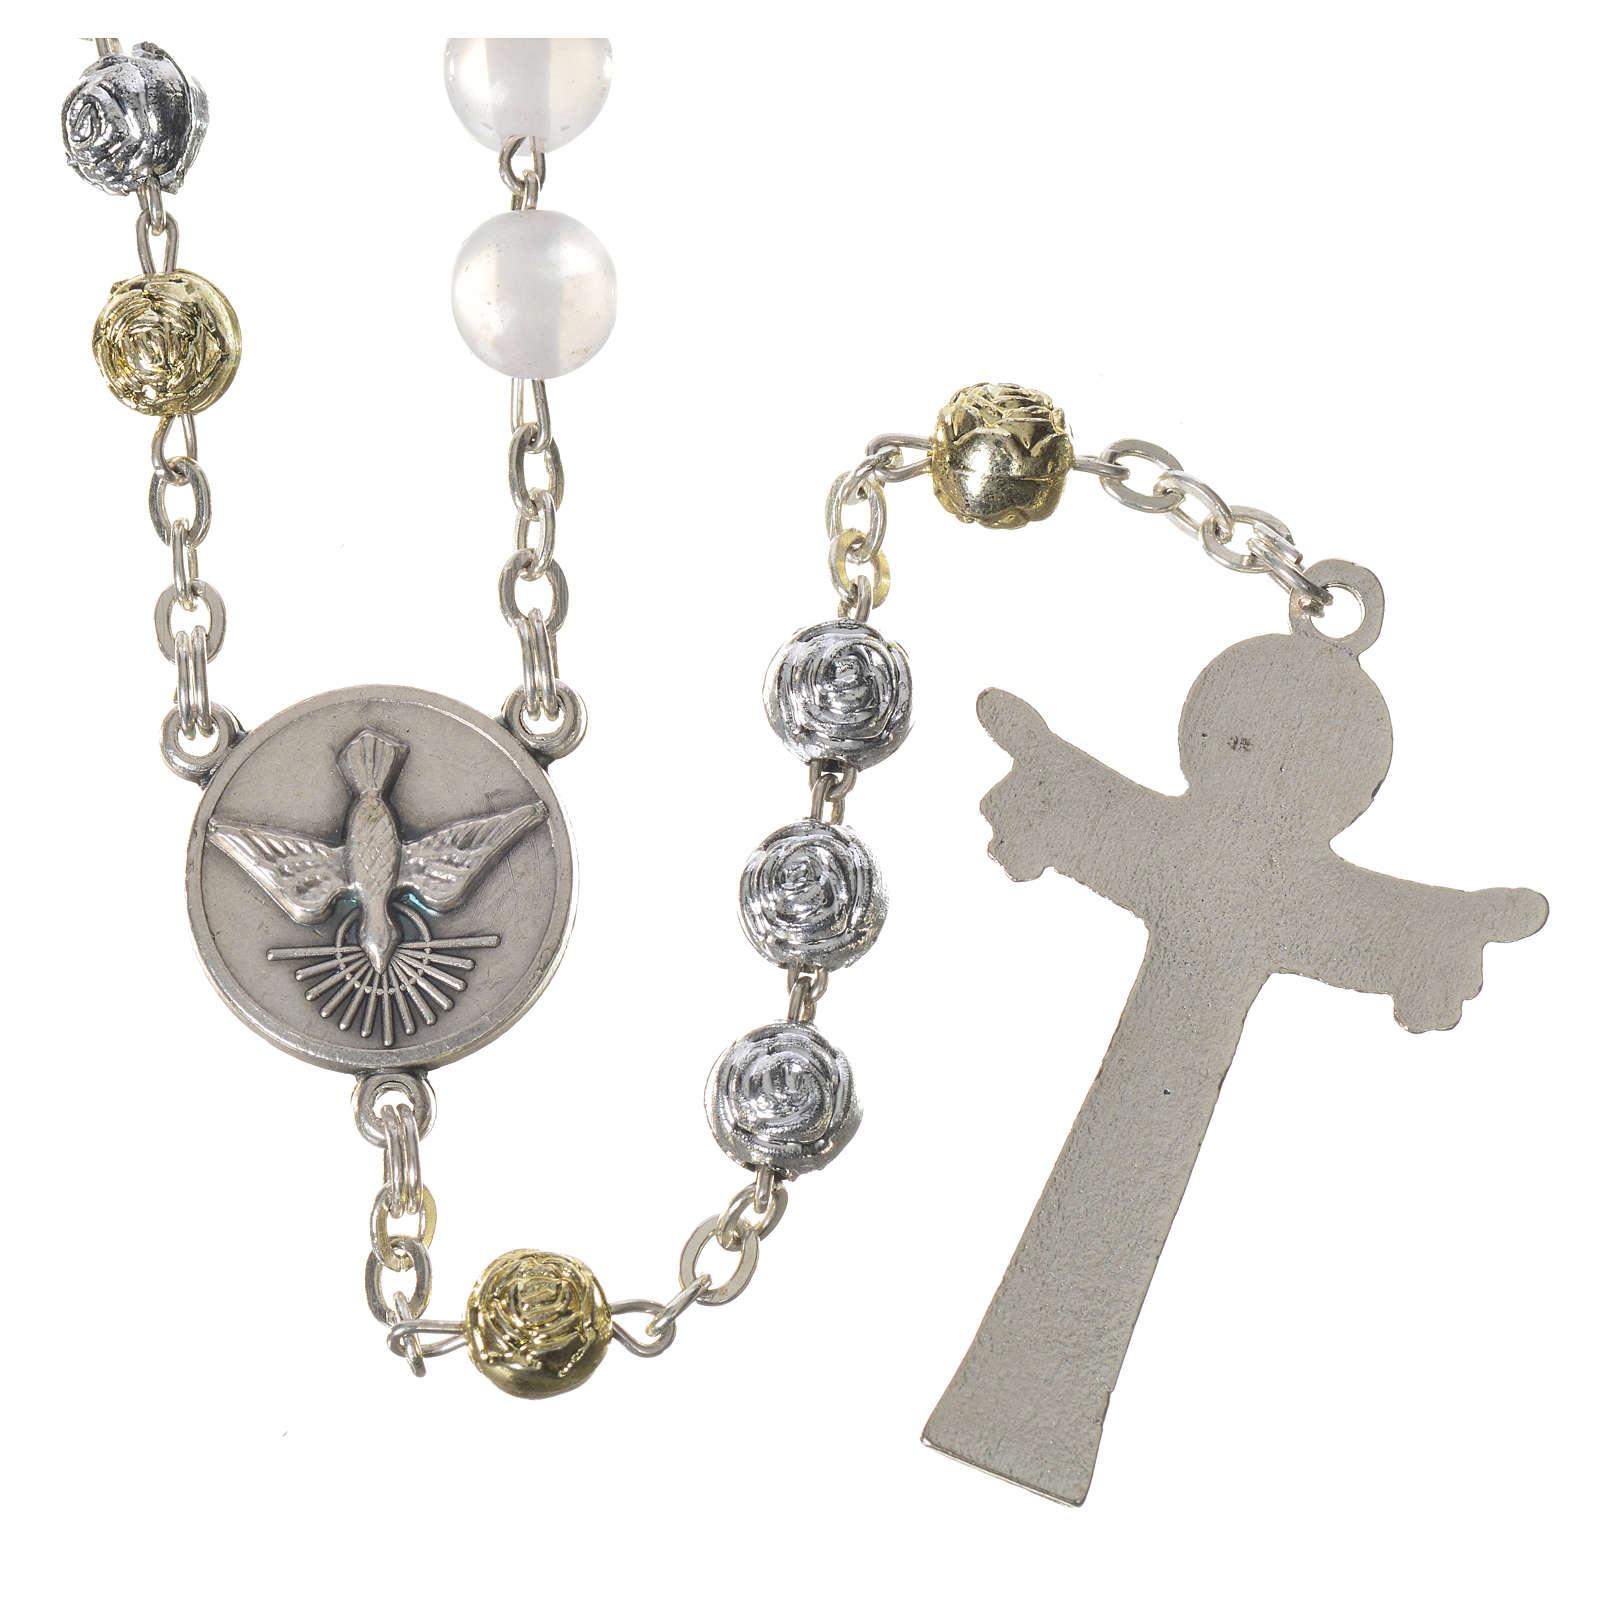 Chapelet Medjugorje imitation perles Saint Esprit 4